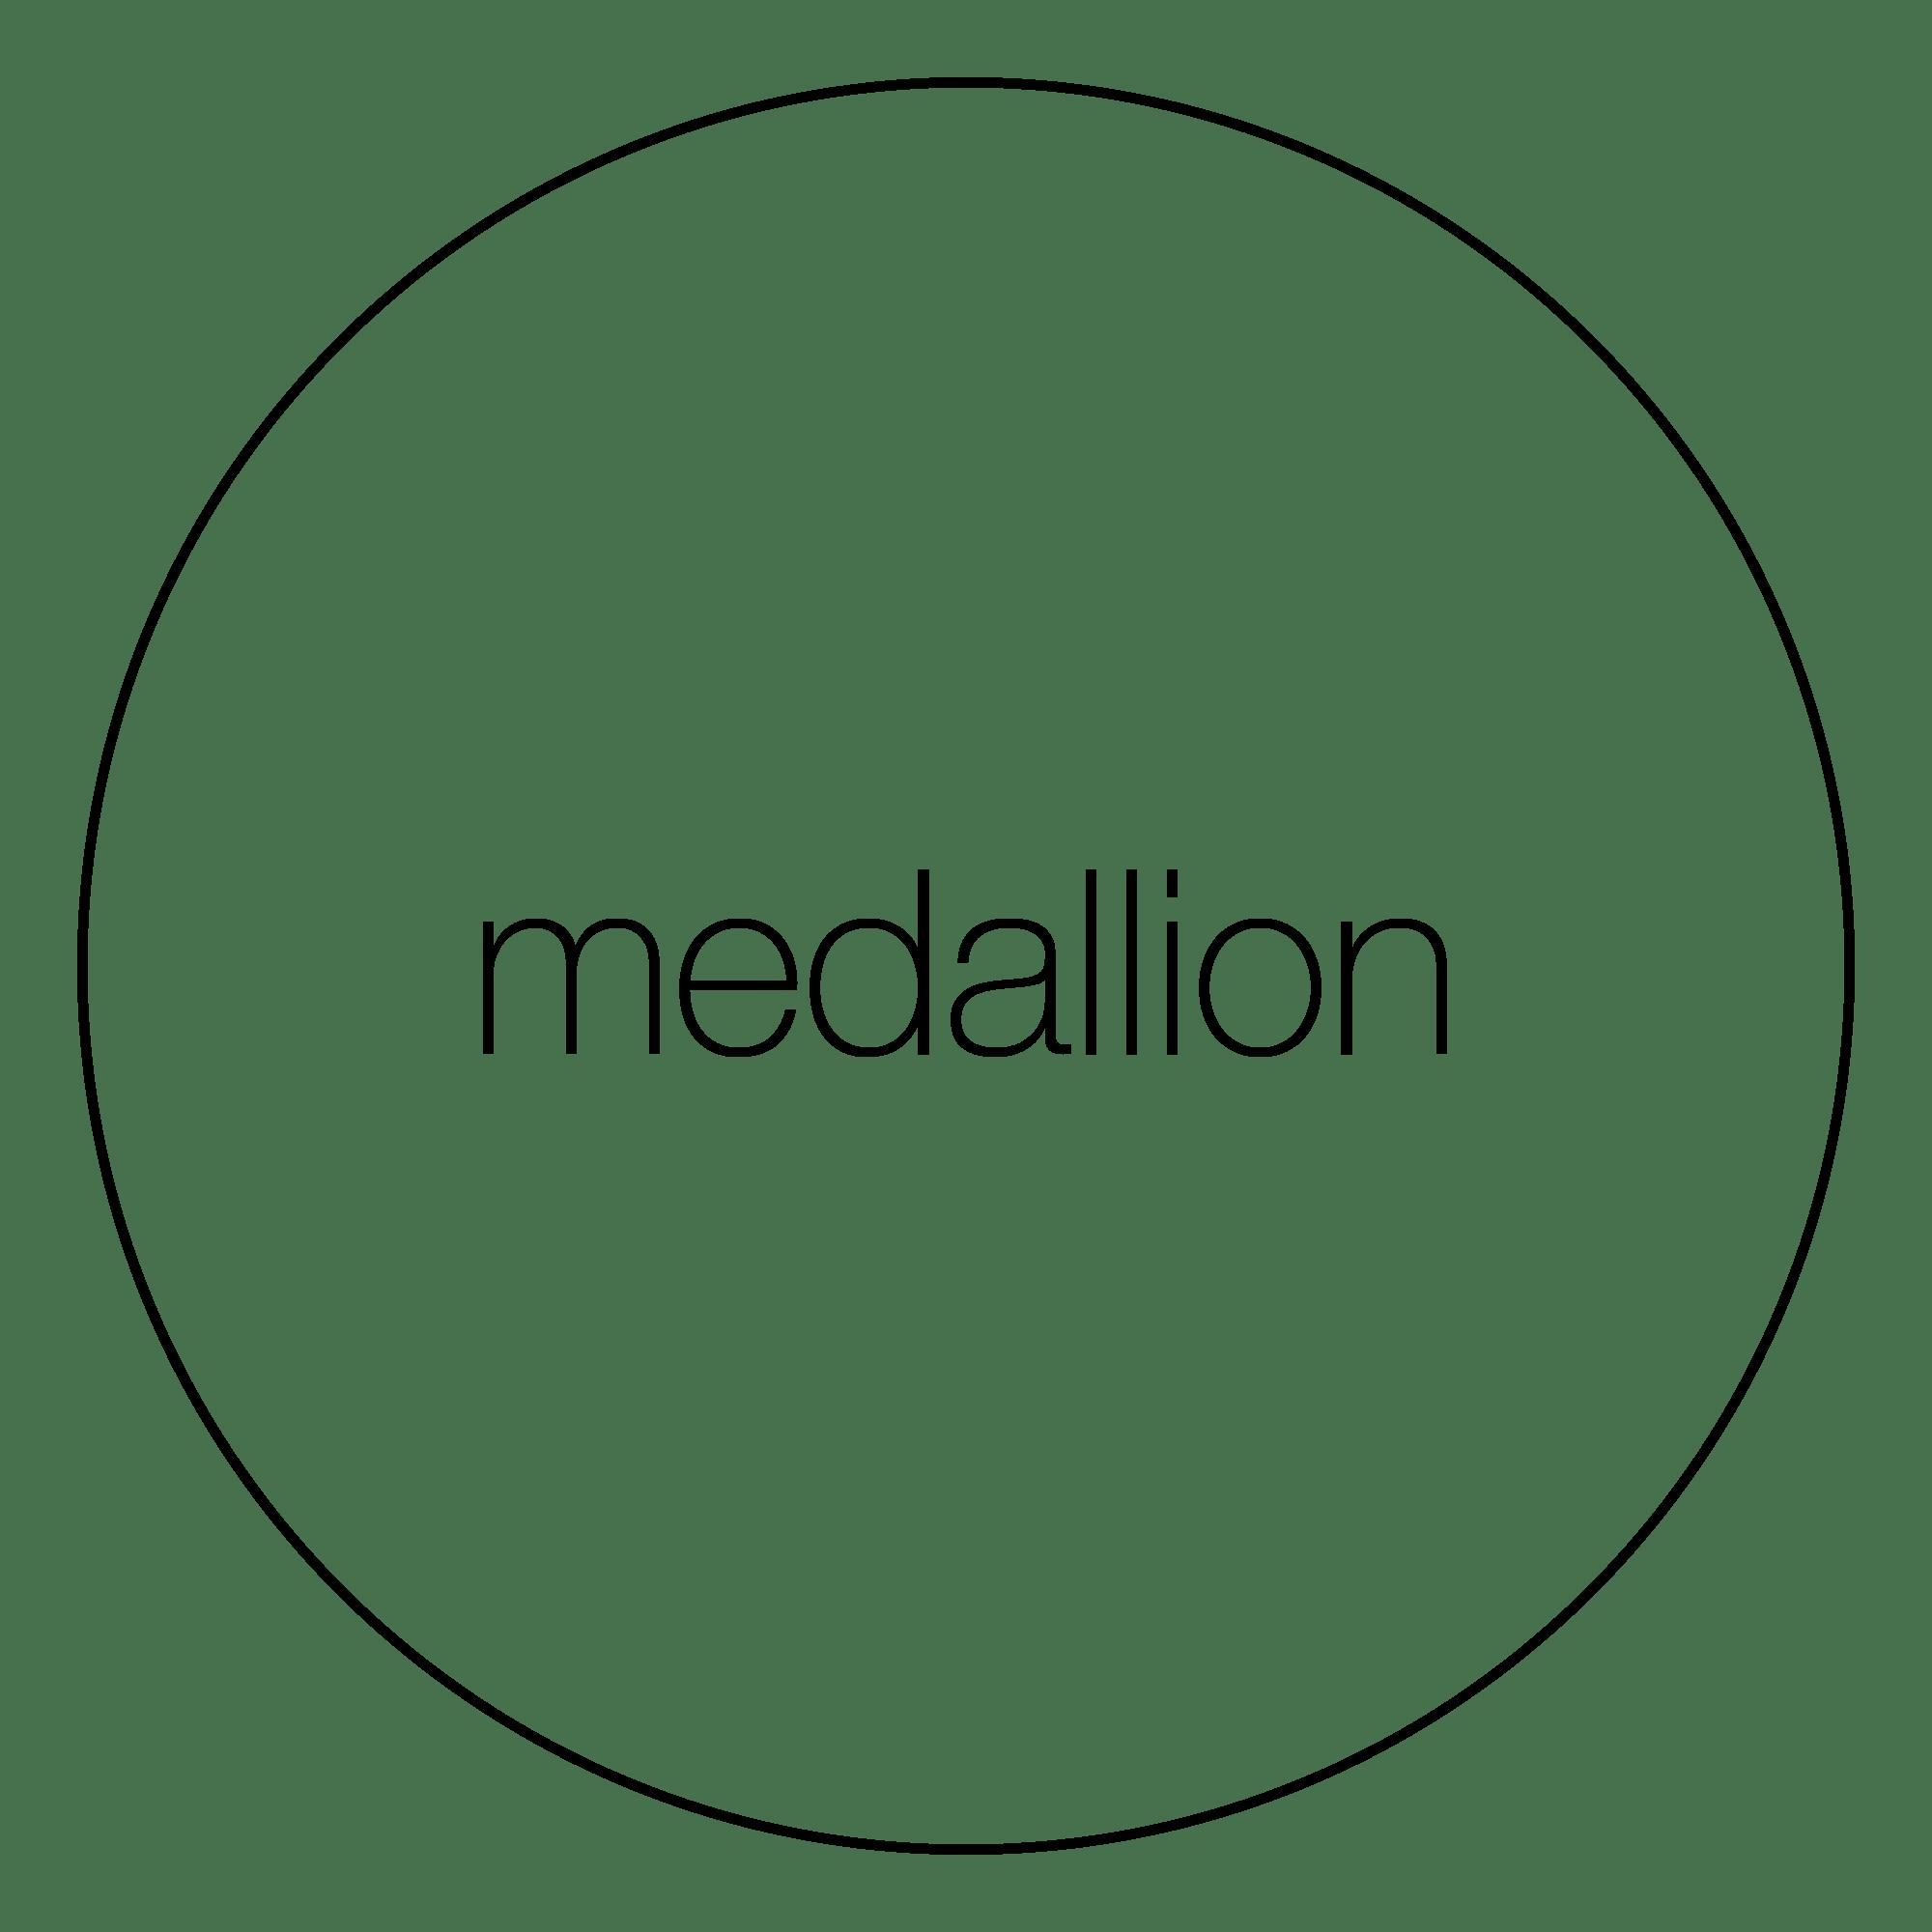 attribute-motif-medallion